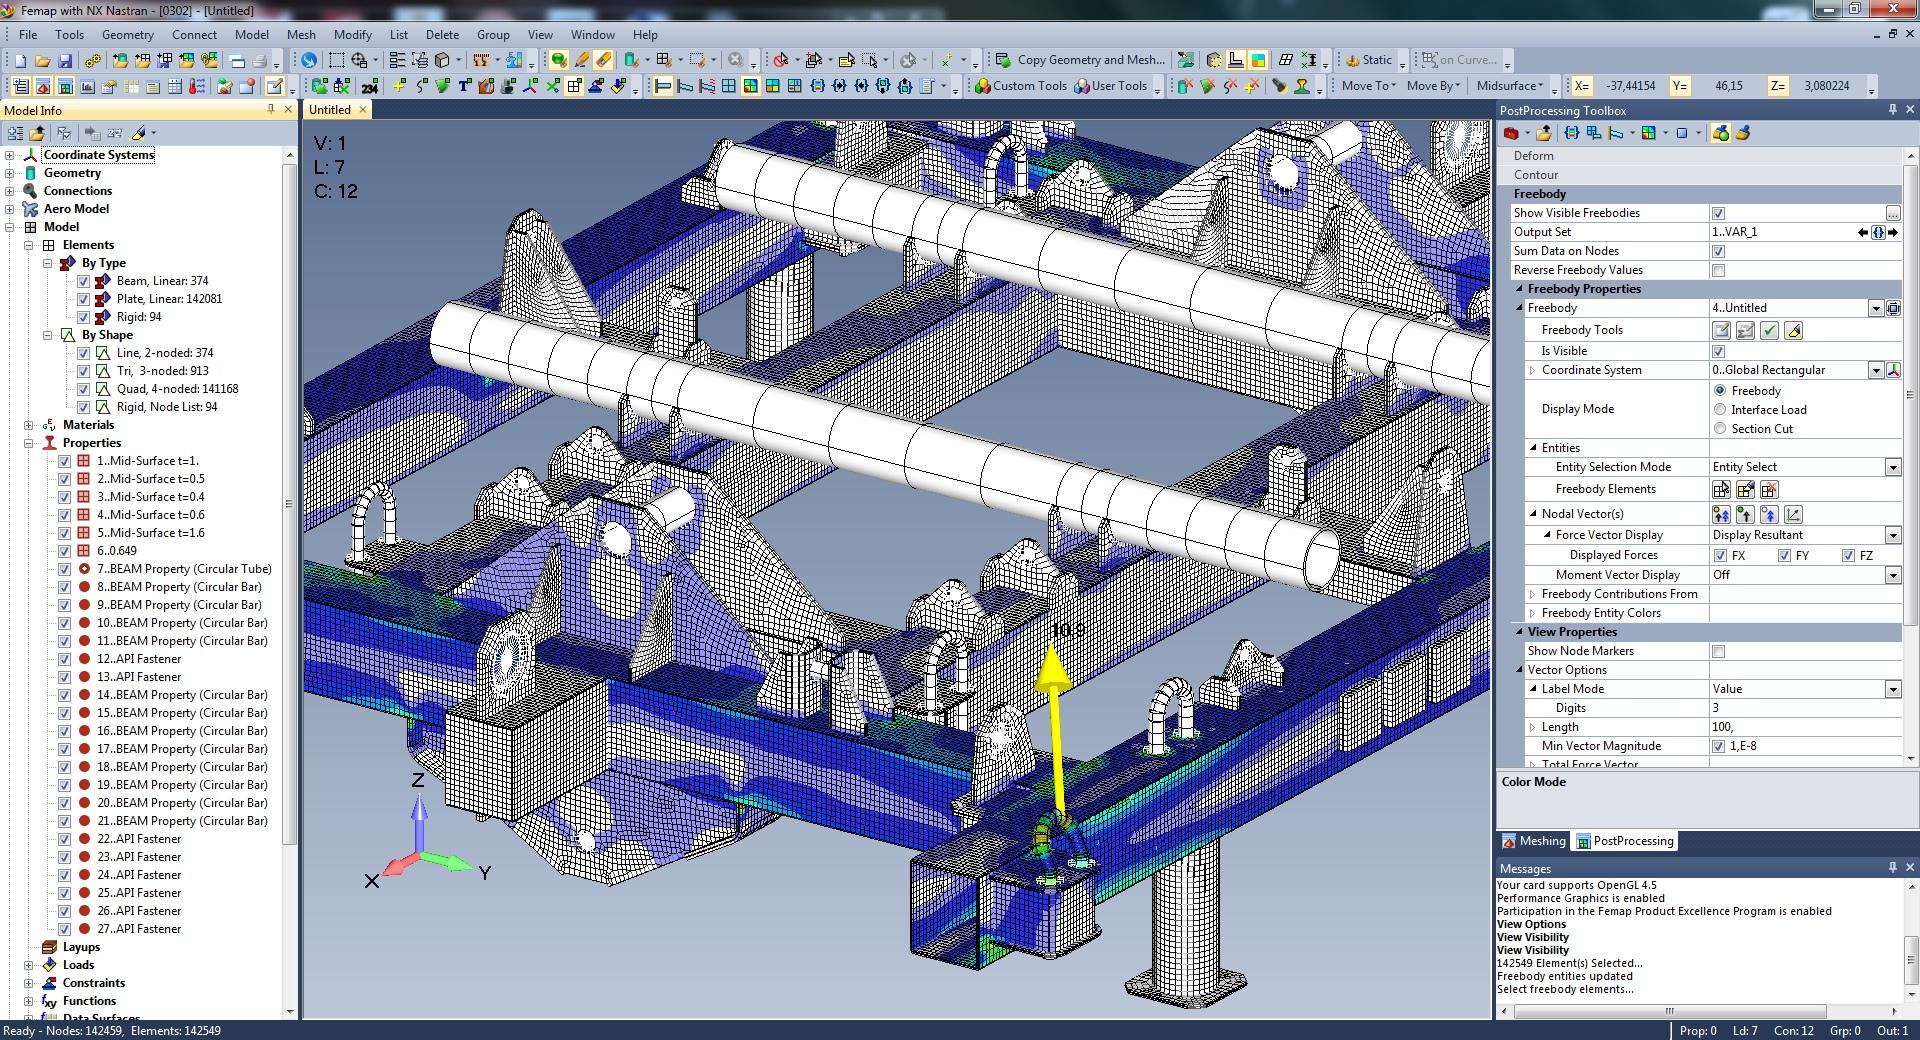 Siemens Femap with NXNastran верификация аттестация в ростехнадзоре